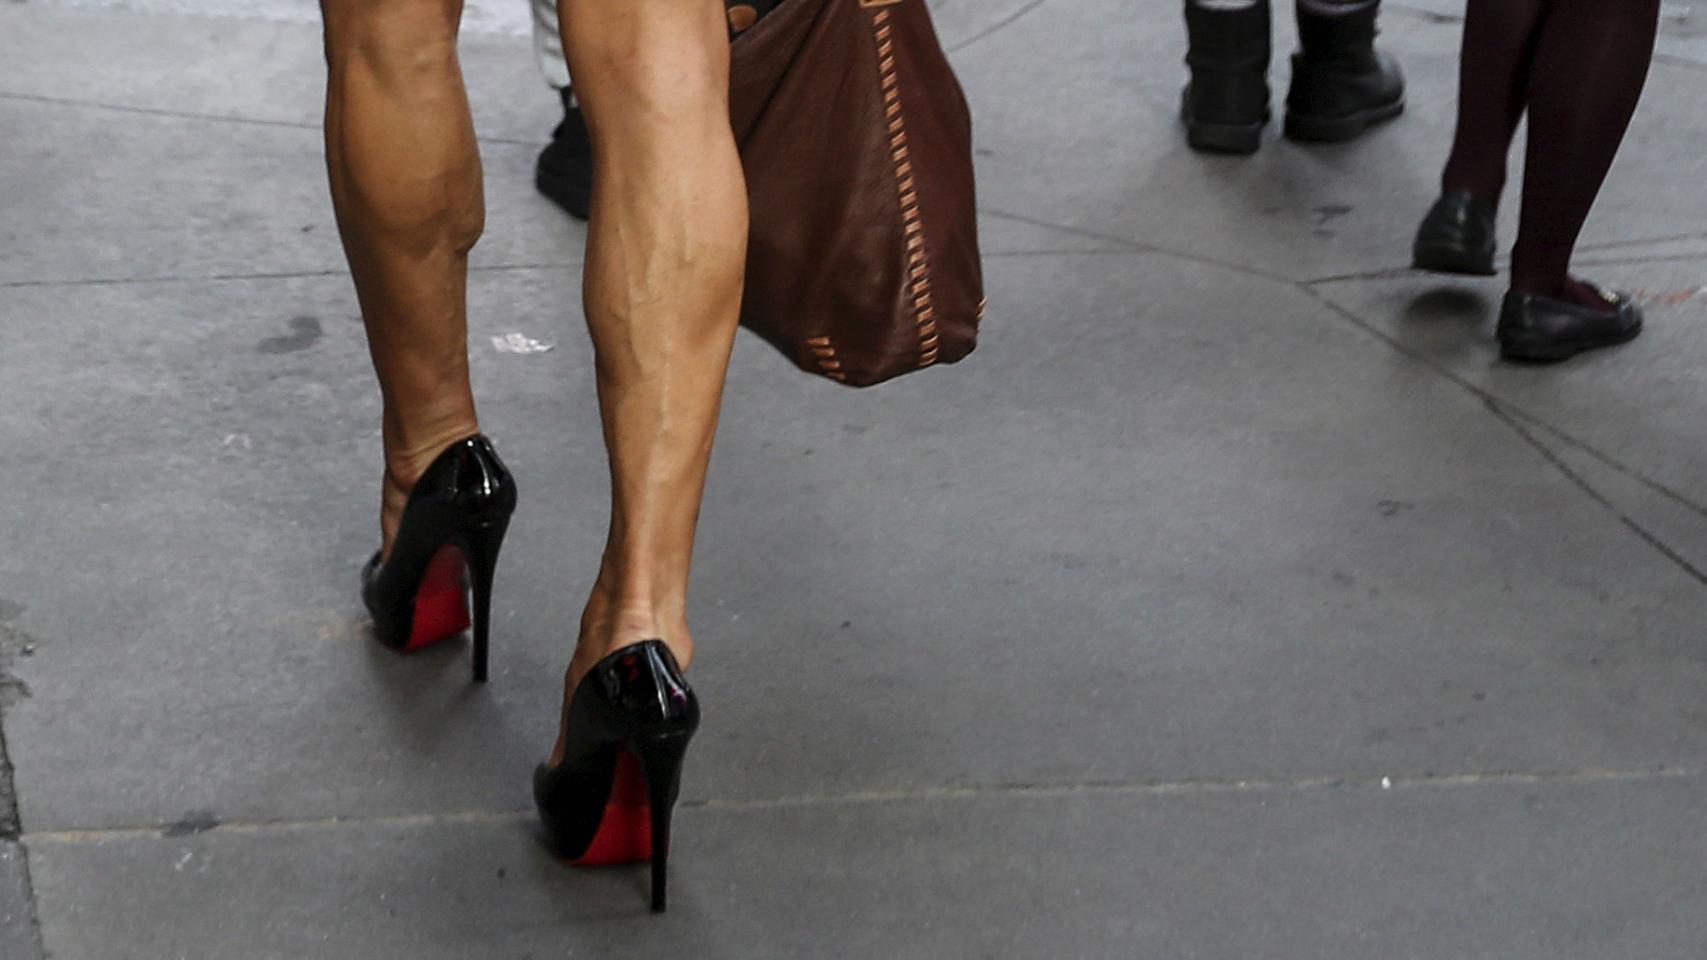 man in heels 2